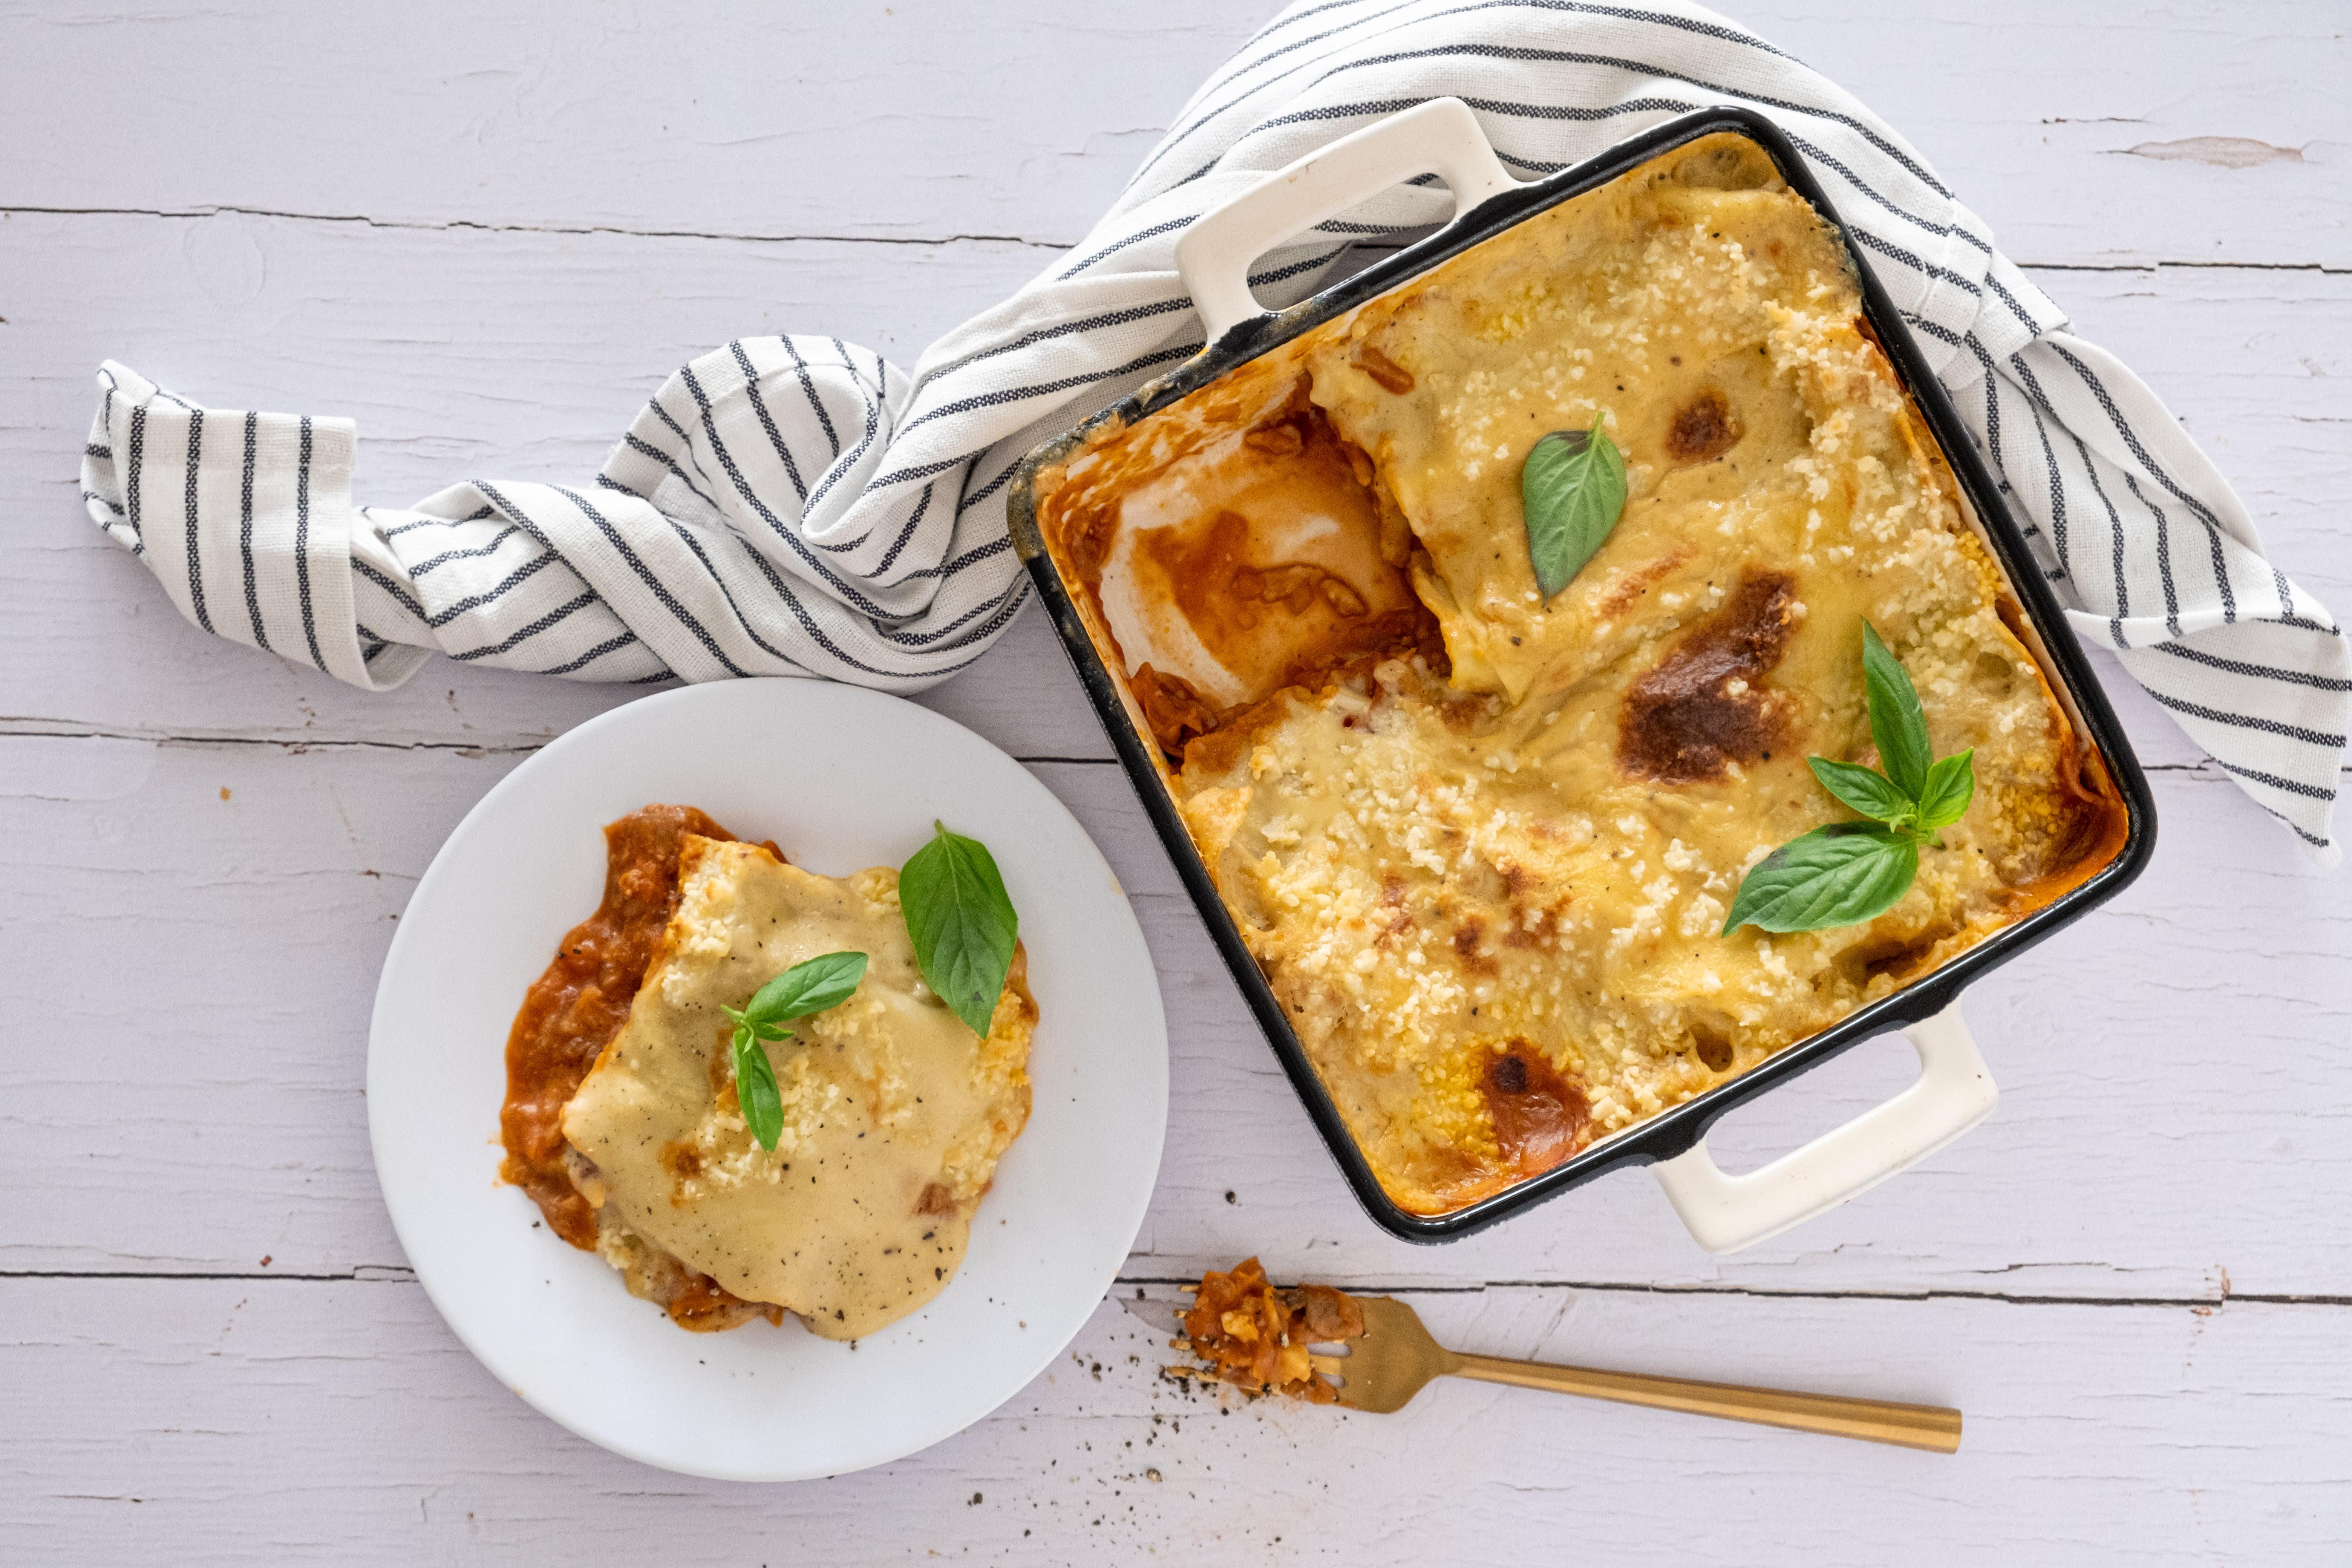 Vegan Lasagna with Mushrooms and Vegan Mozzarella